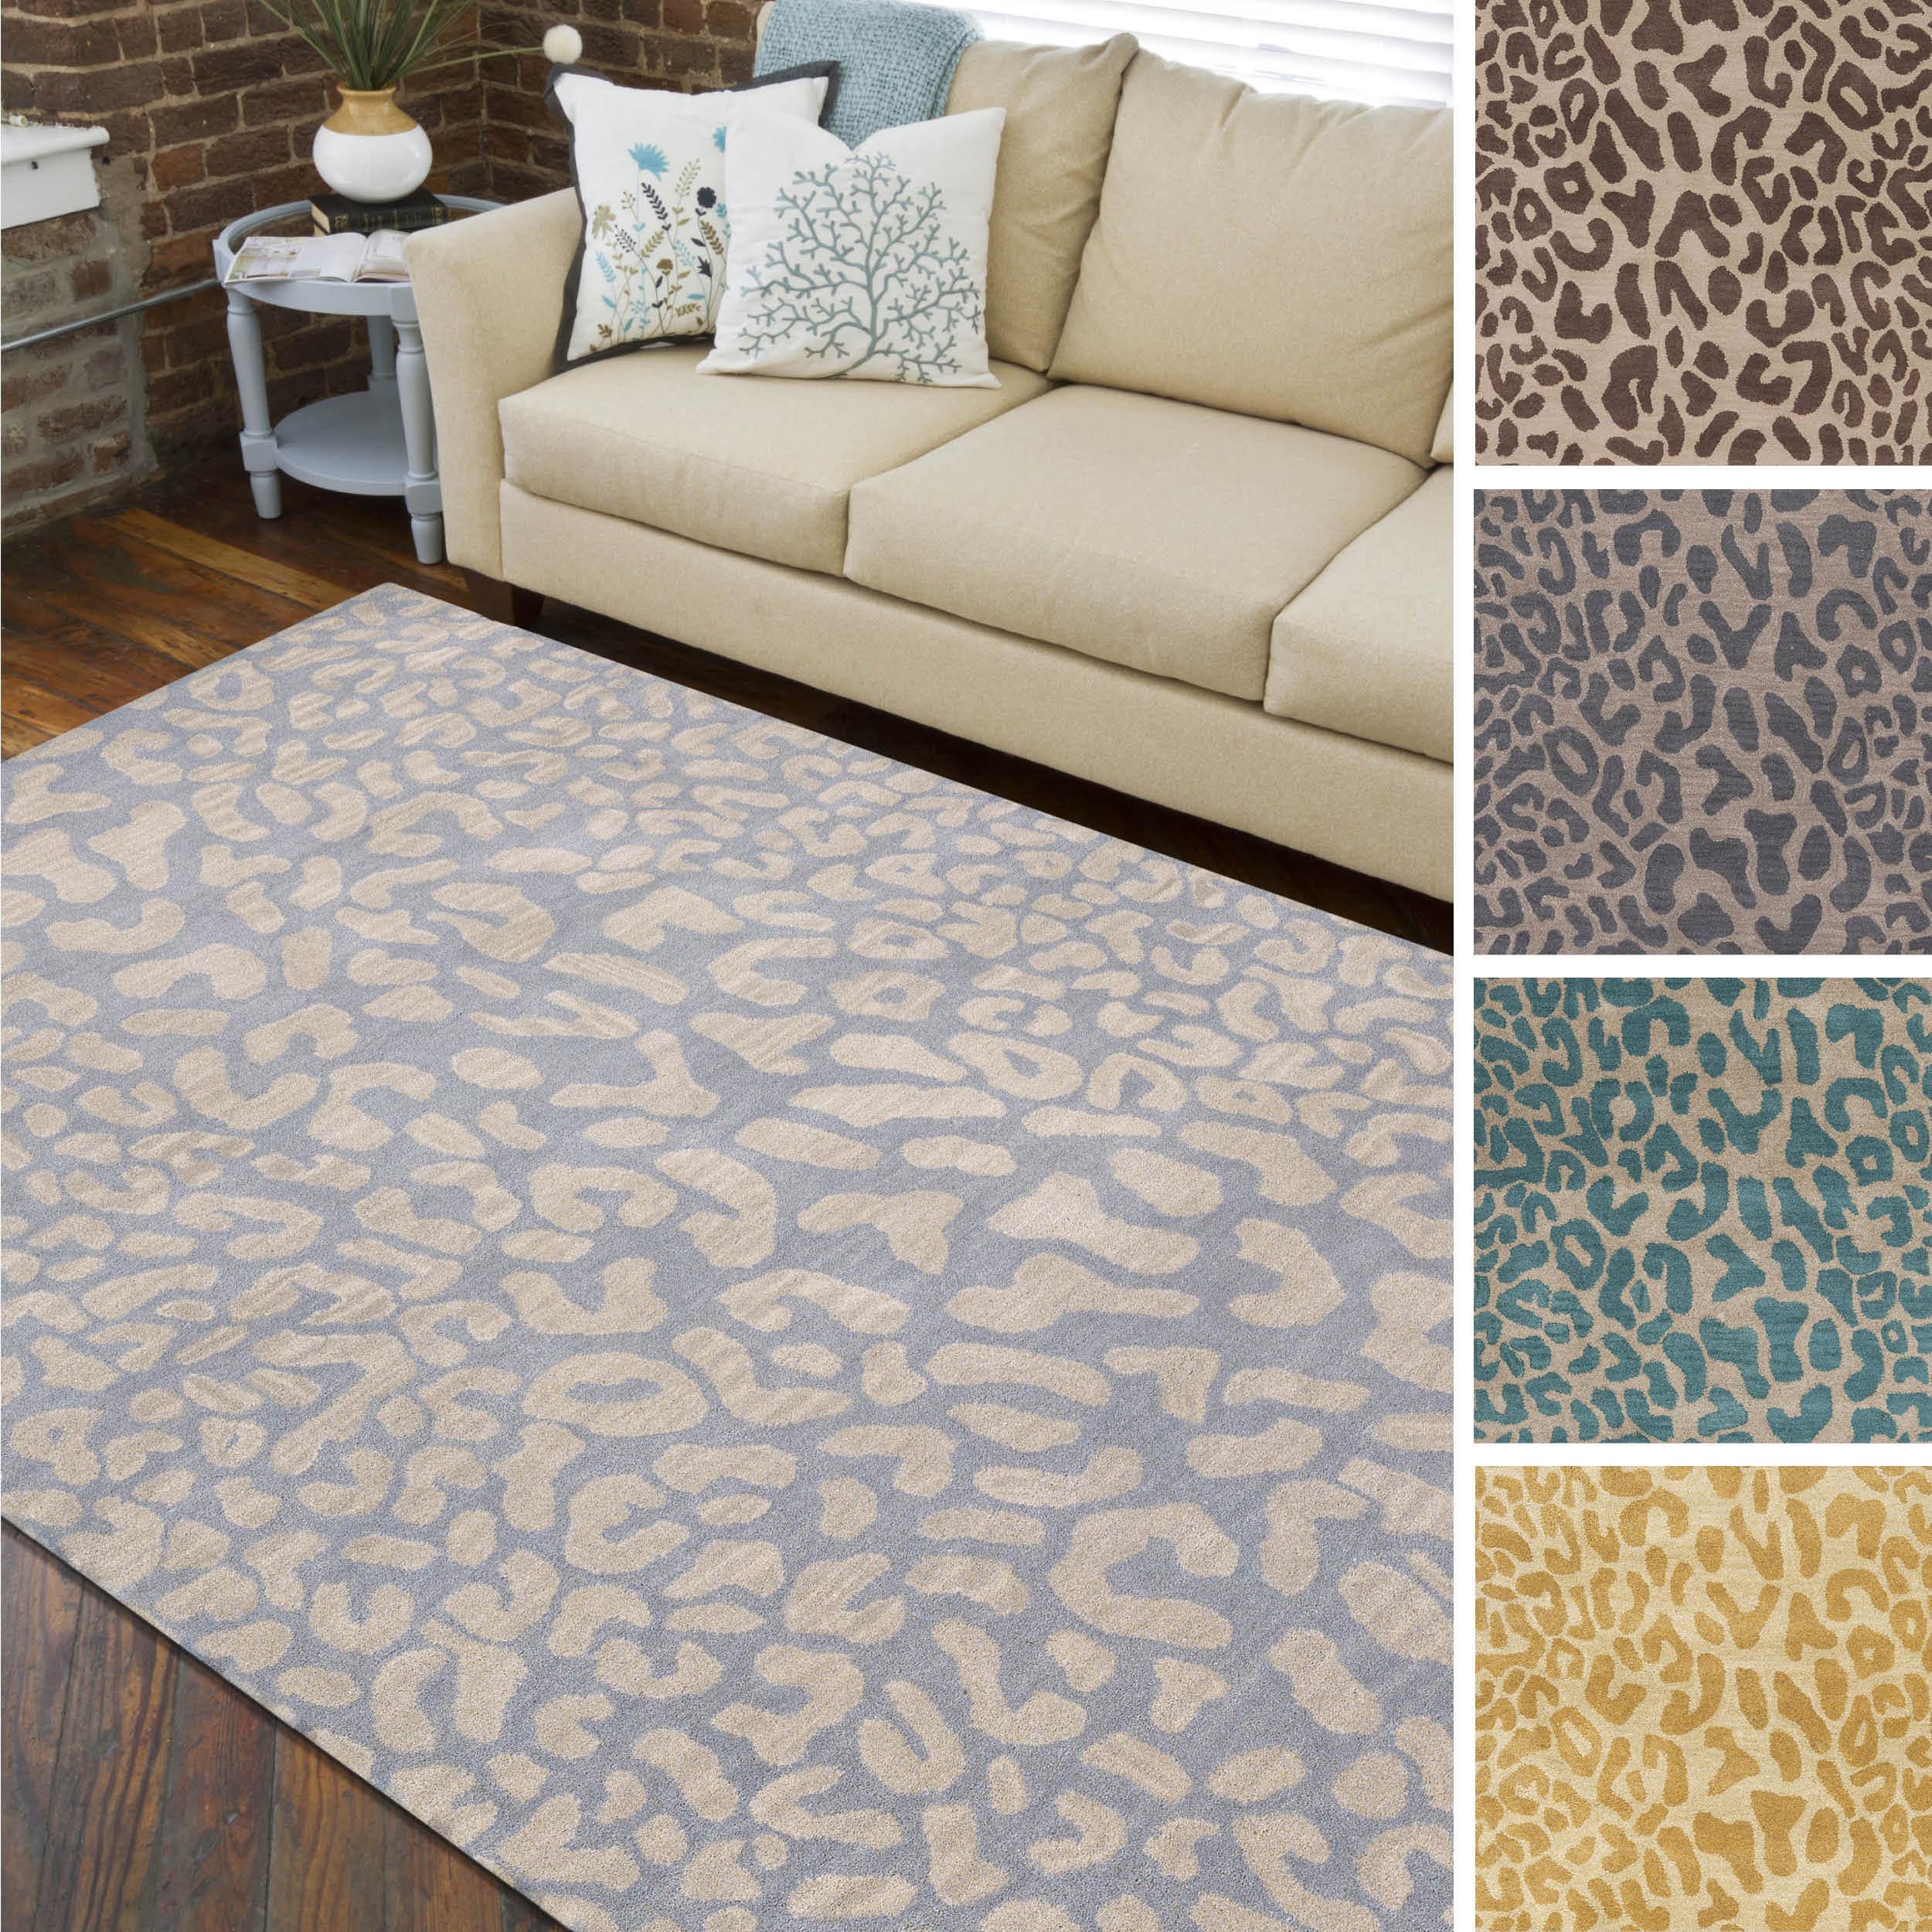 Shop Hand Tufted Jungle Animal Print Wool Area Rug 6 X